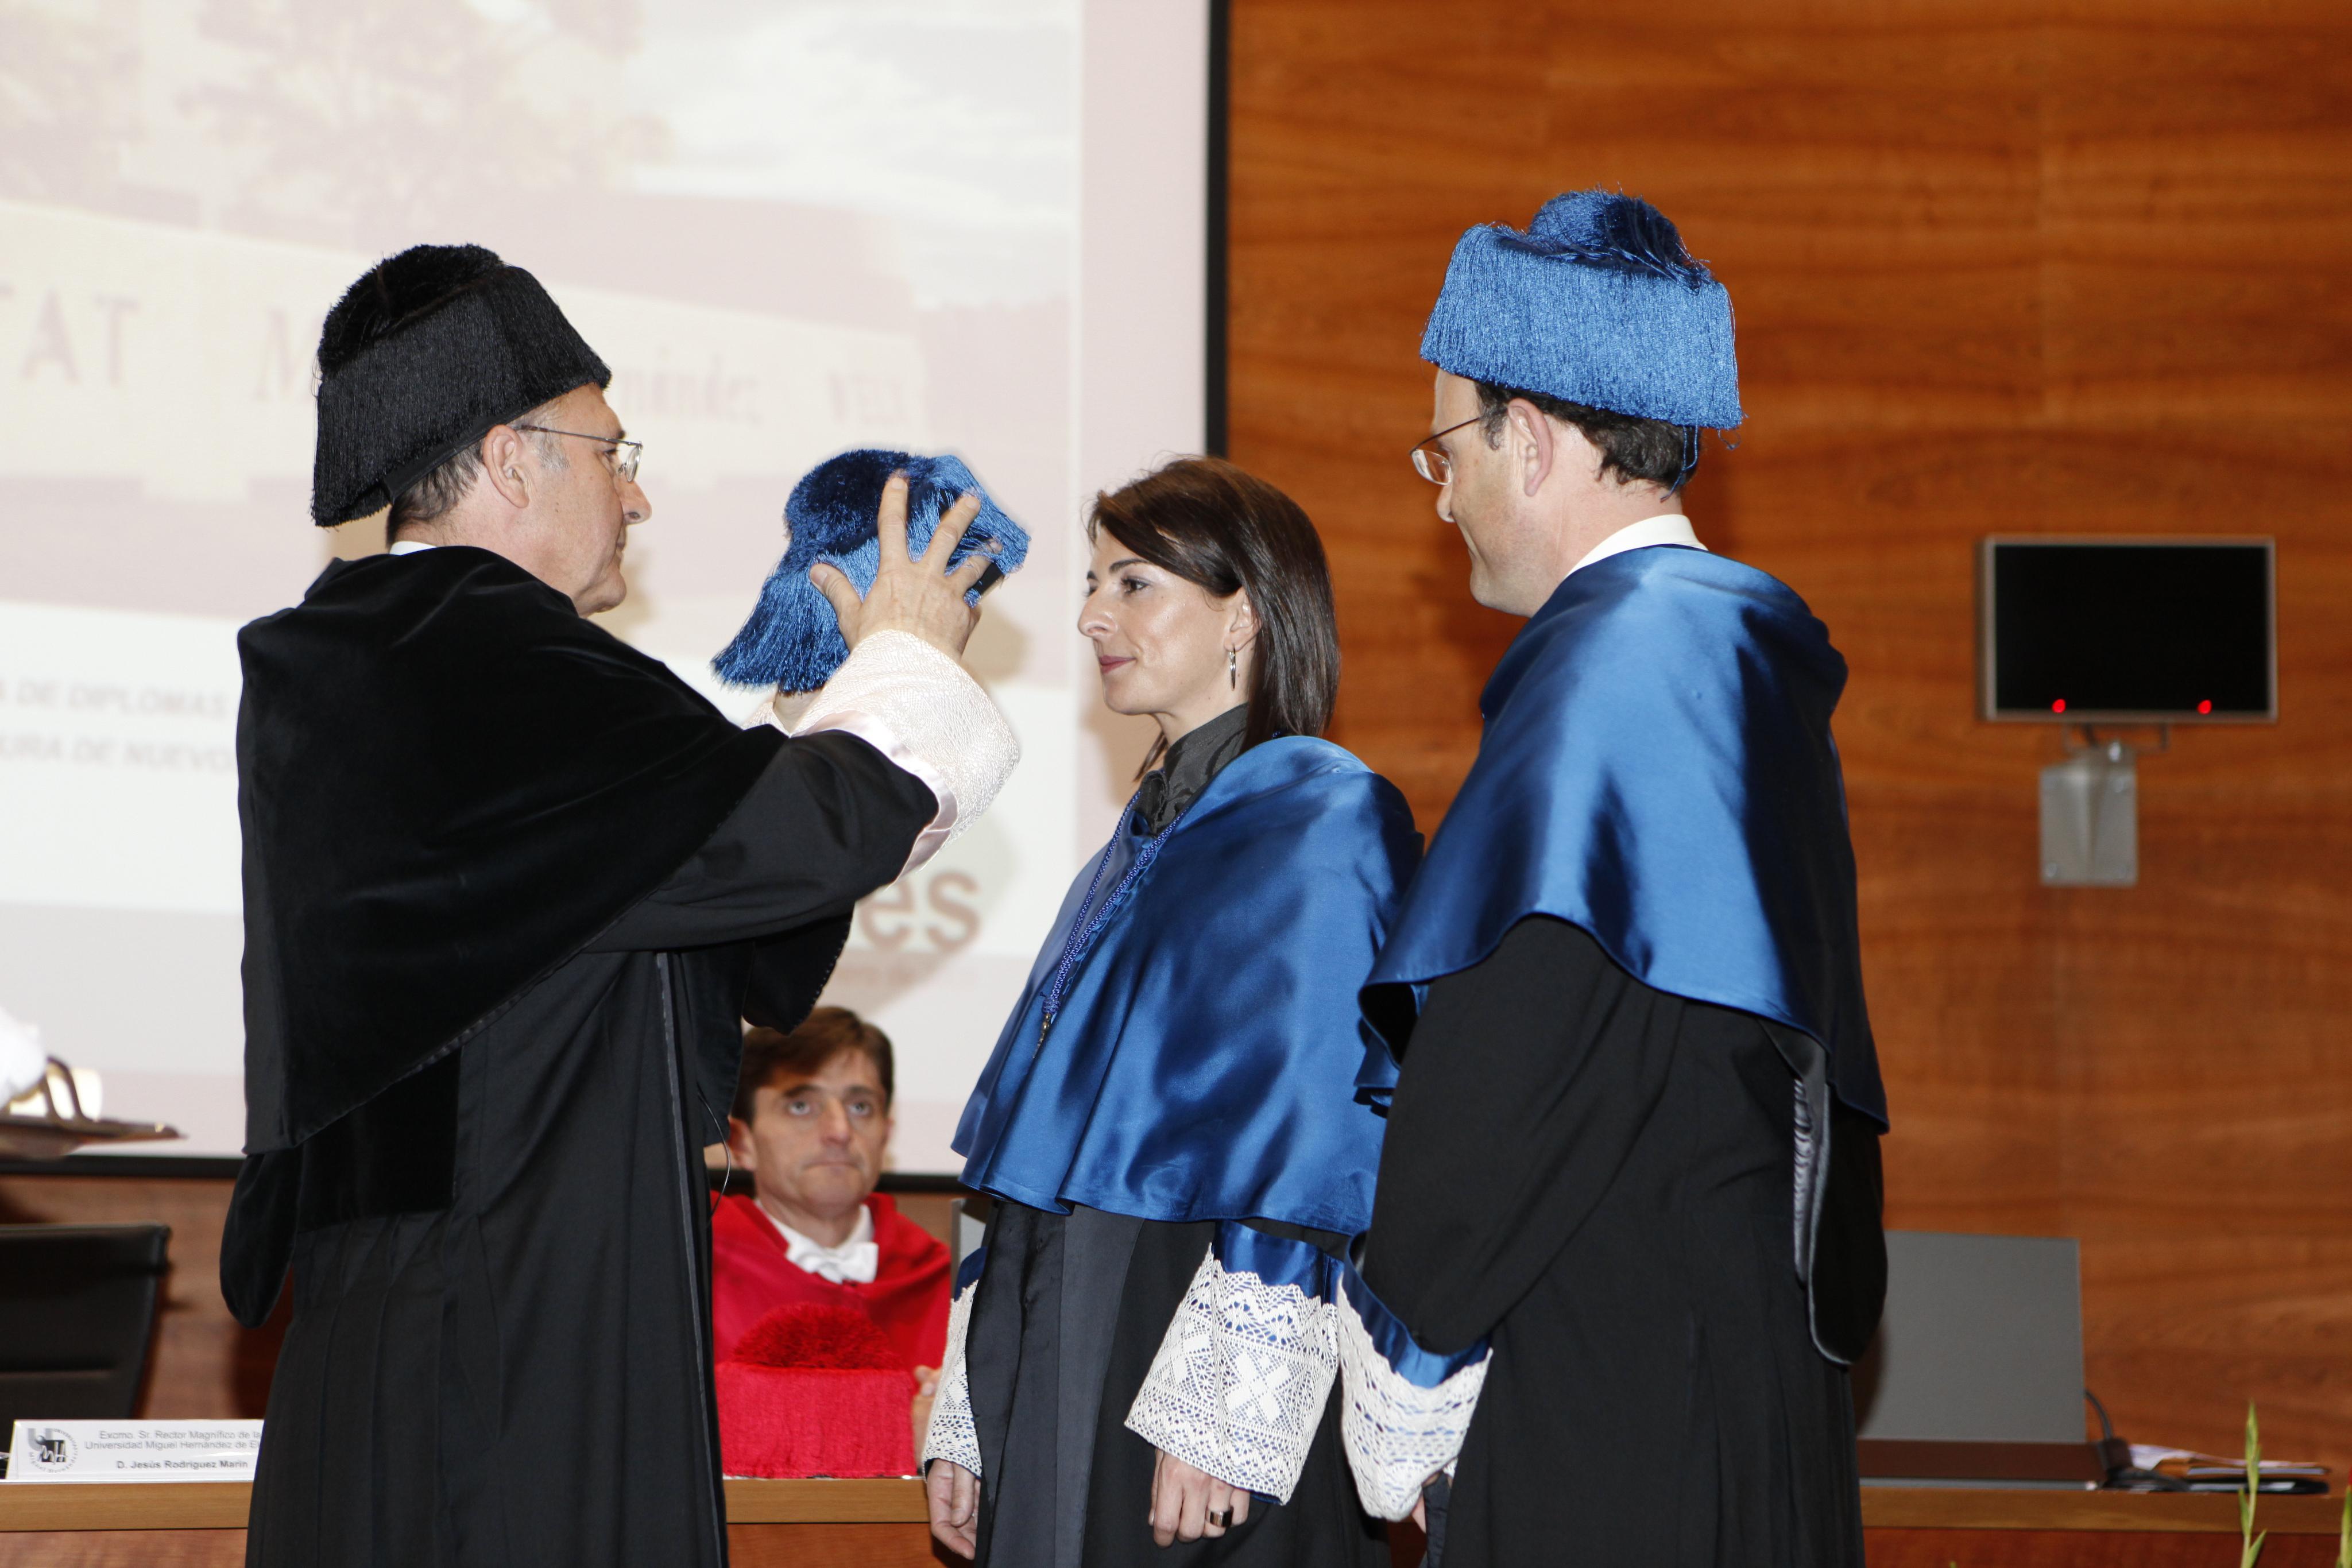 Entrega Diplomas_mg_5424.jpg